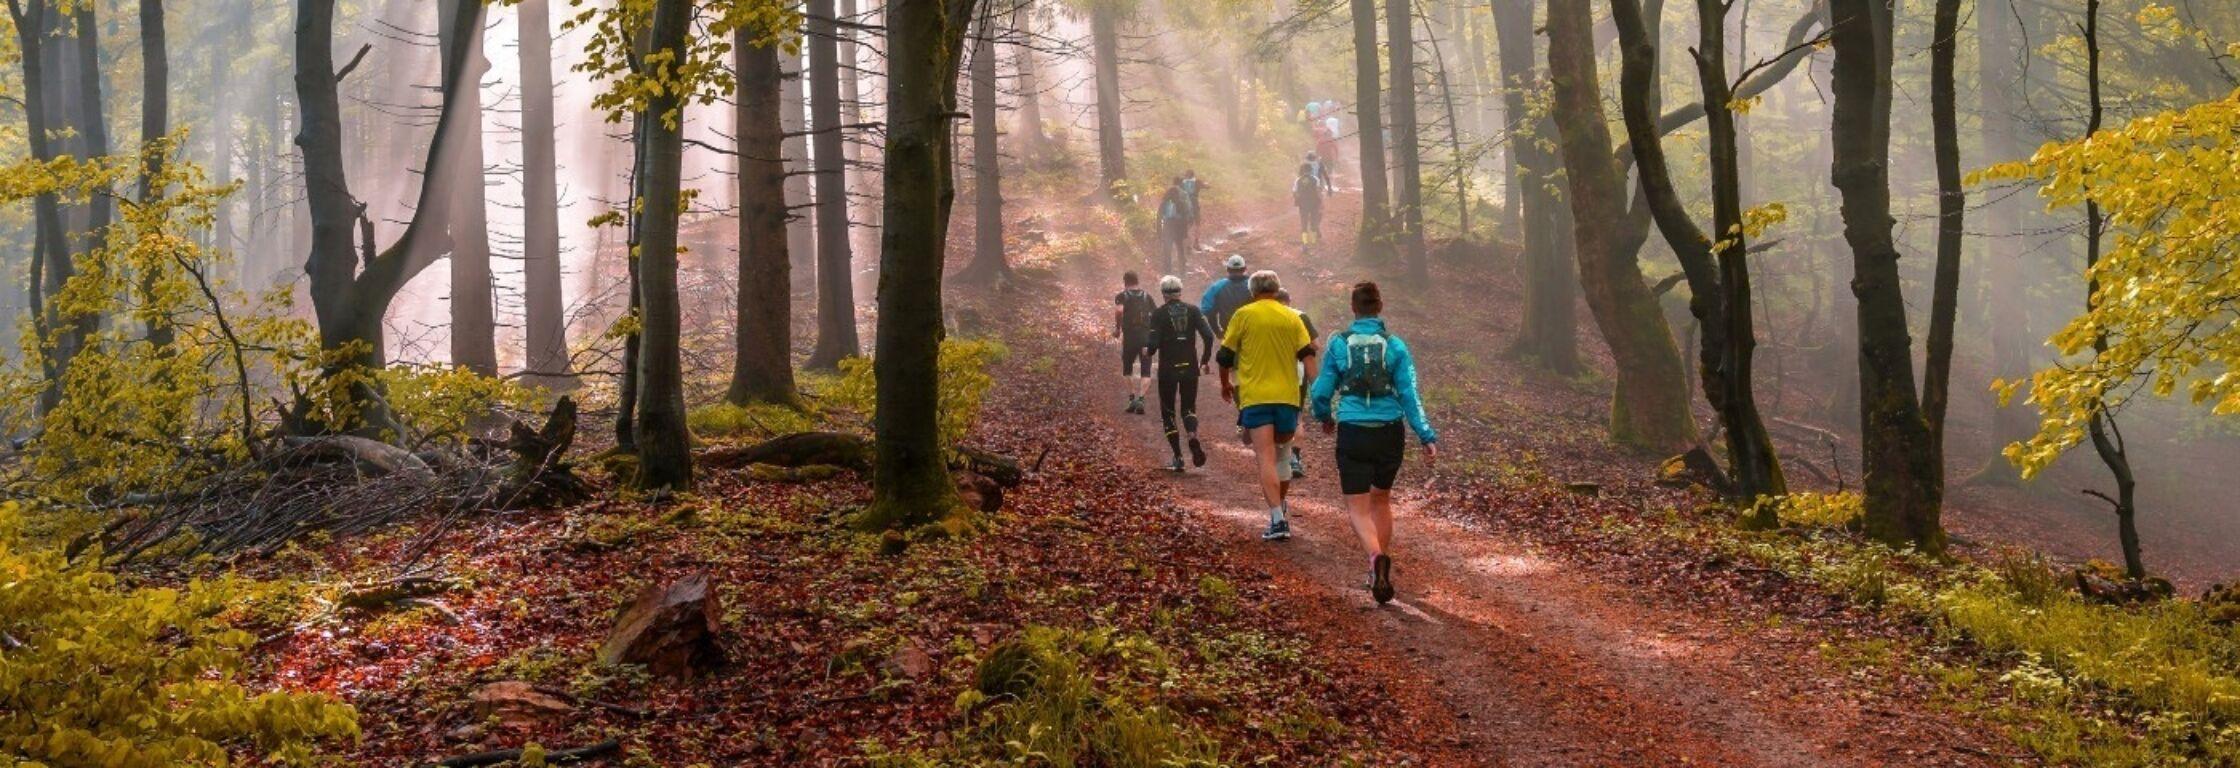 Hoe begin je met trailrunning?